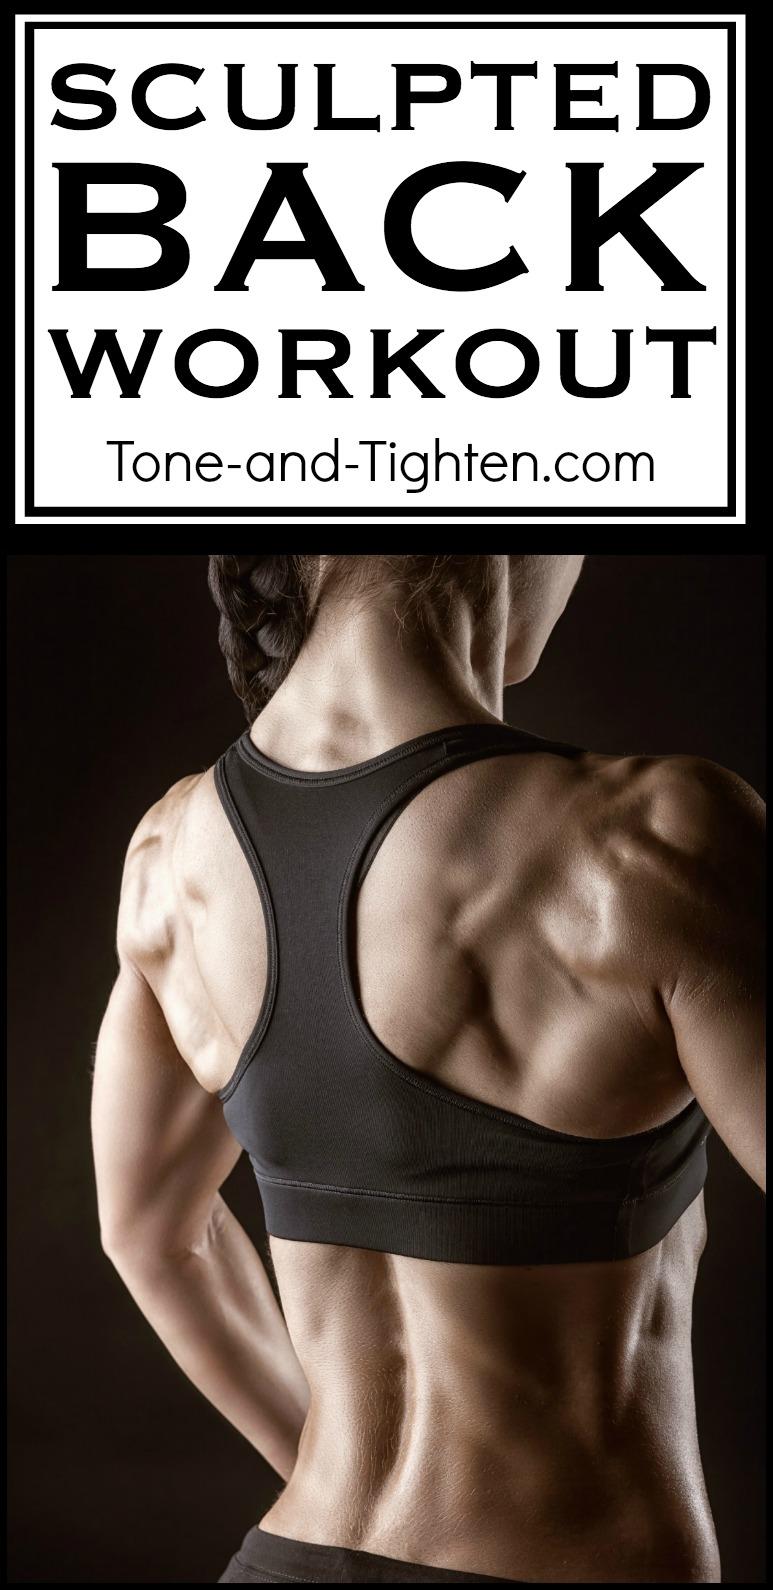 Best Back Workout Gym Tone Tighten